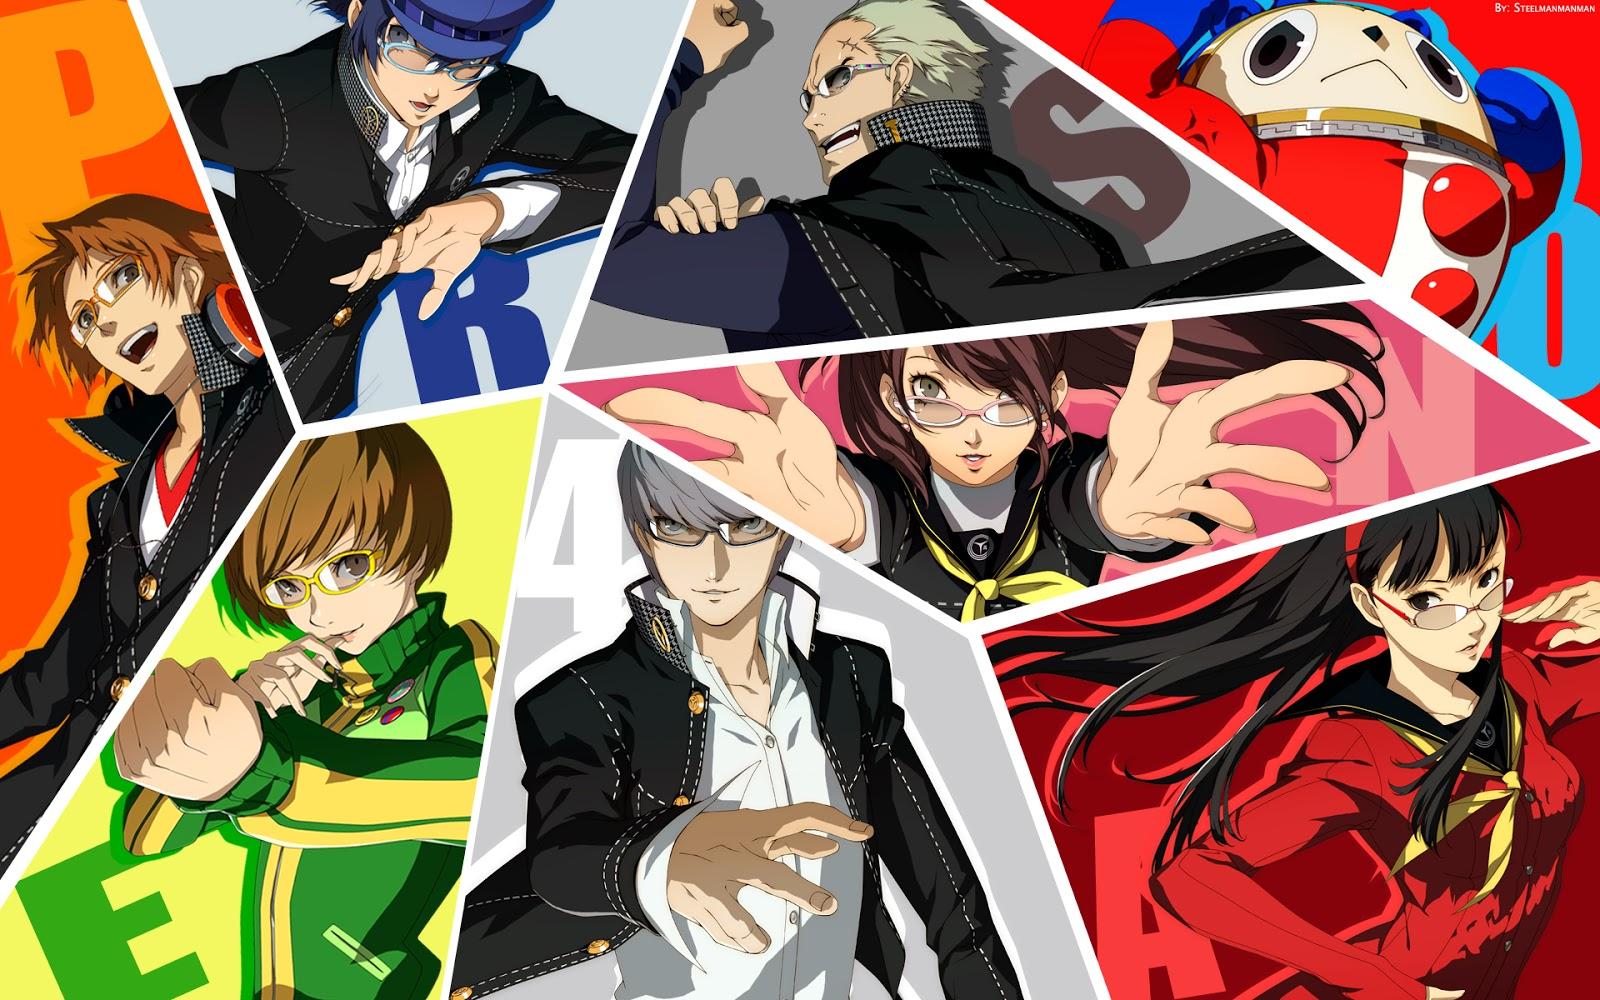 Free download Teddie Persona 4 Anime HD Wallpaper Desktop PC